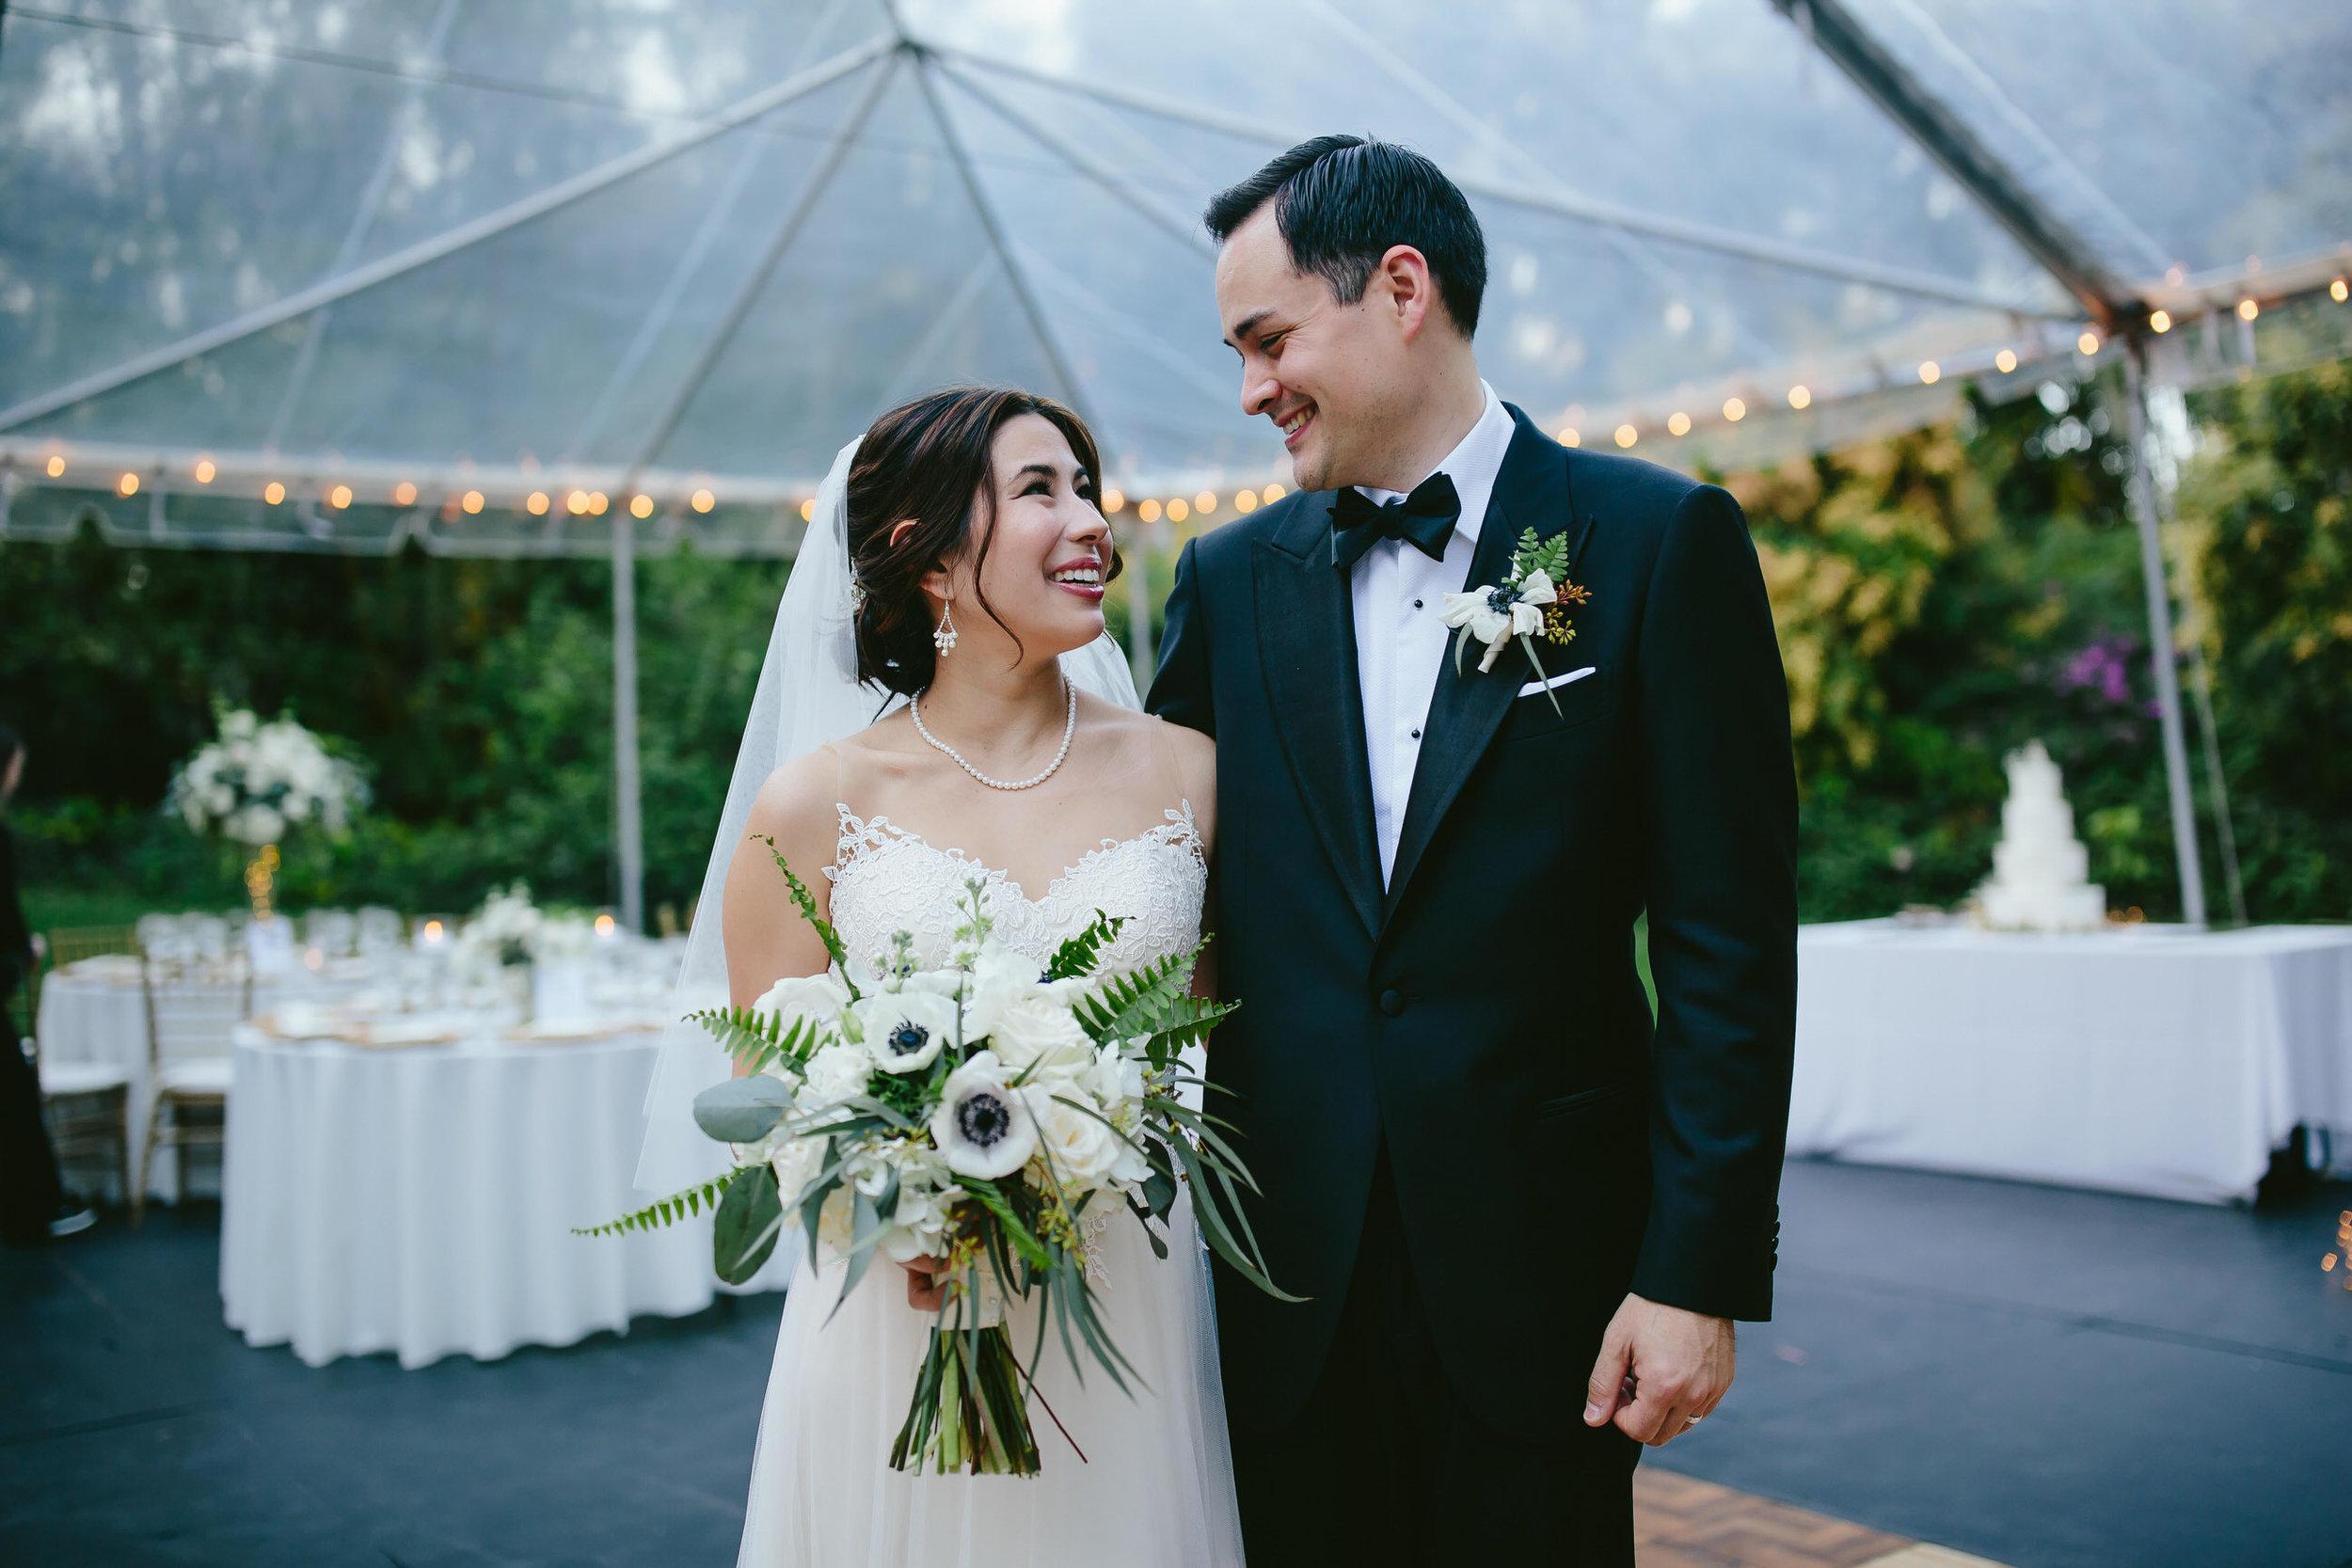 cutest_backyard_wedding_tiny_house_photo_bride_groom_couple_love.jpg